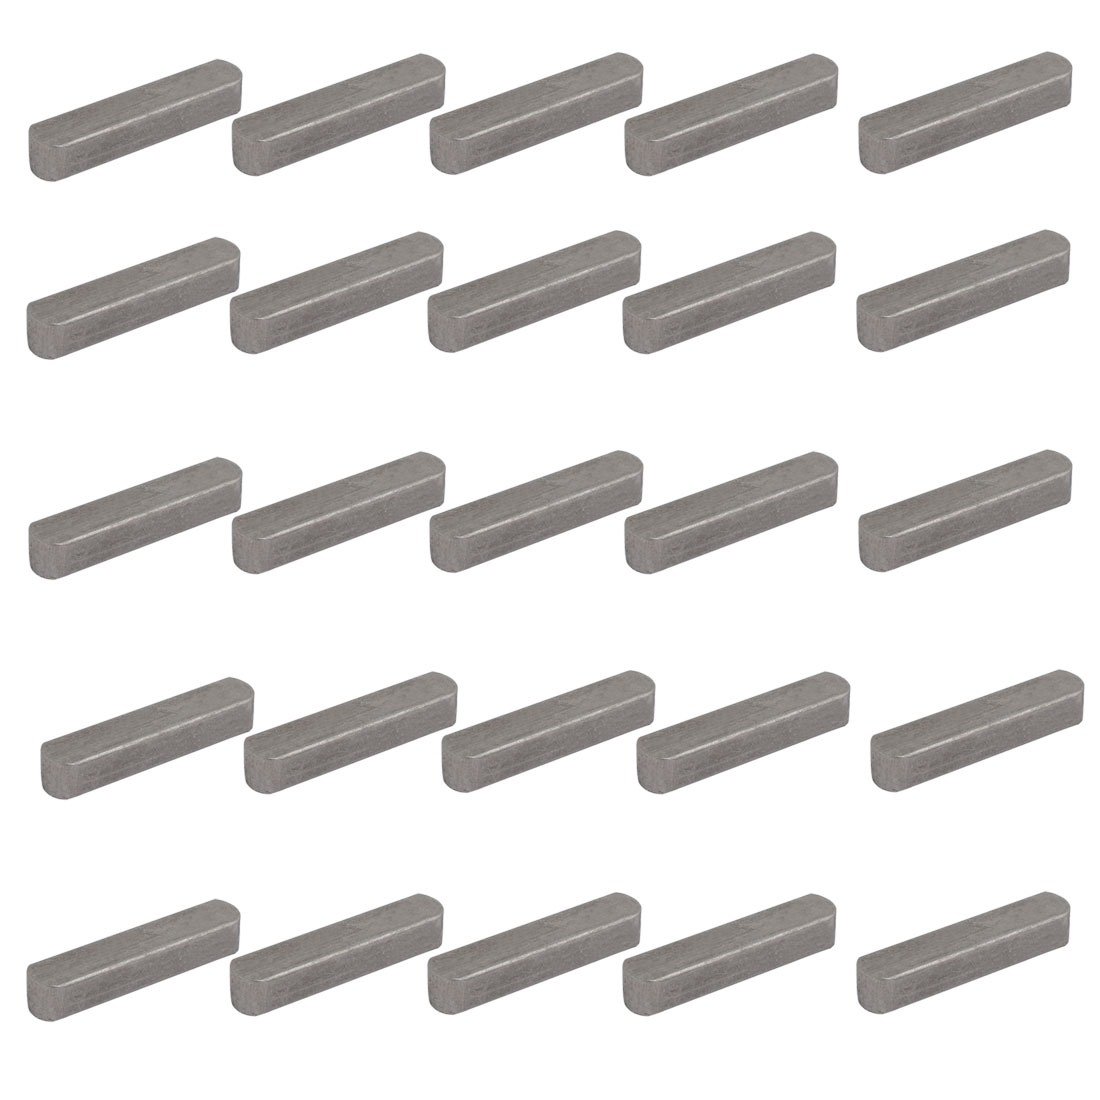 40mmx8mmx7mm Carbon Steel Key Stock To Lock Pulleys 25pcs